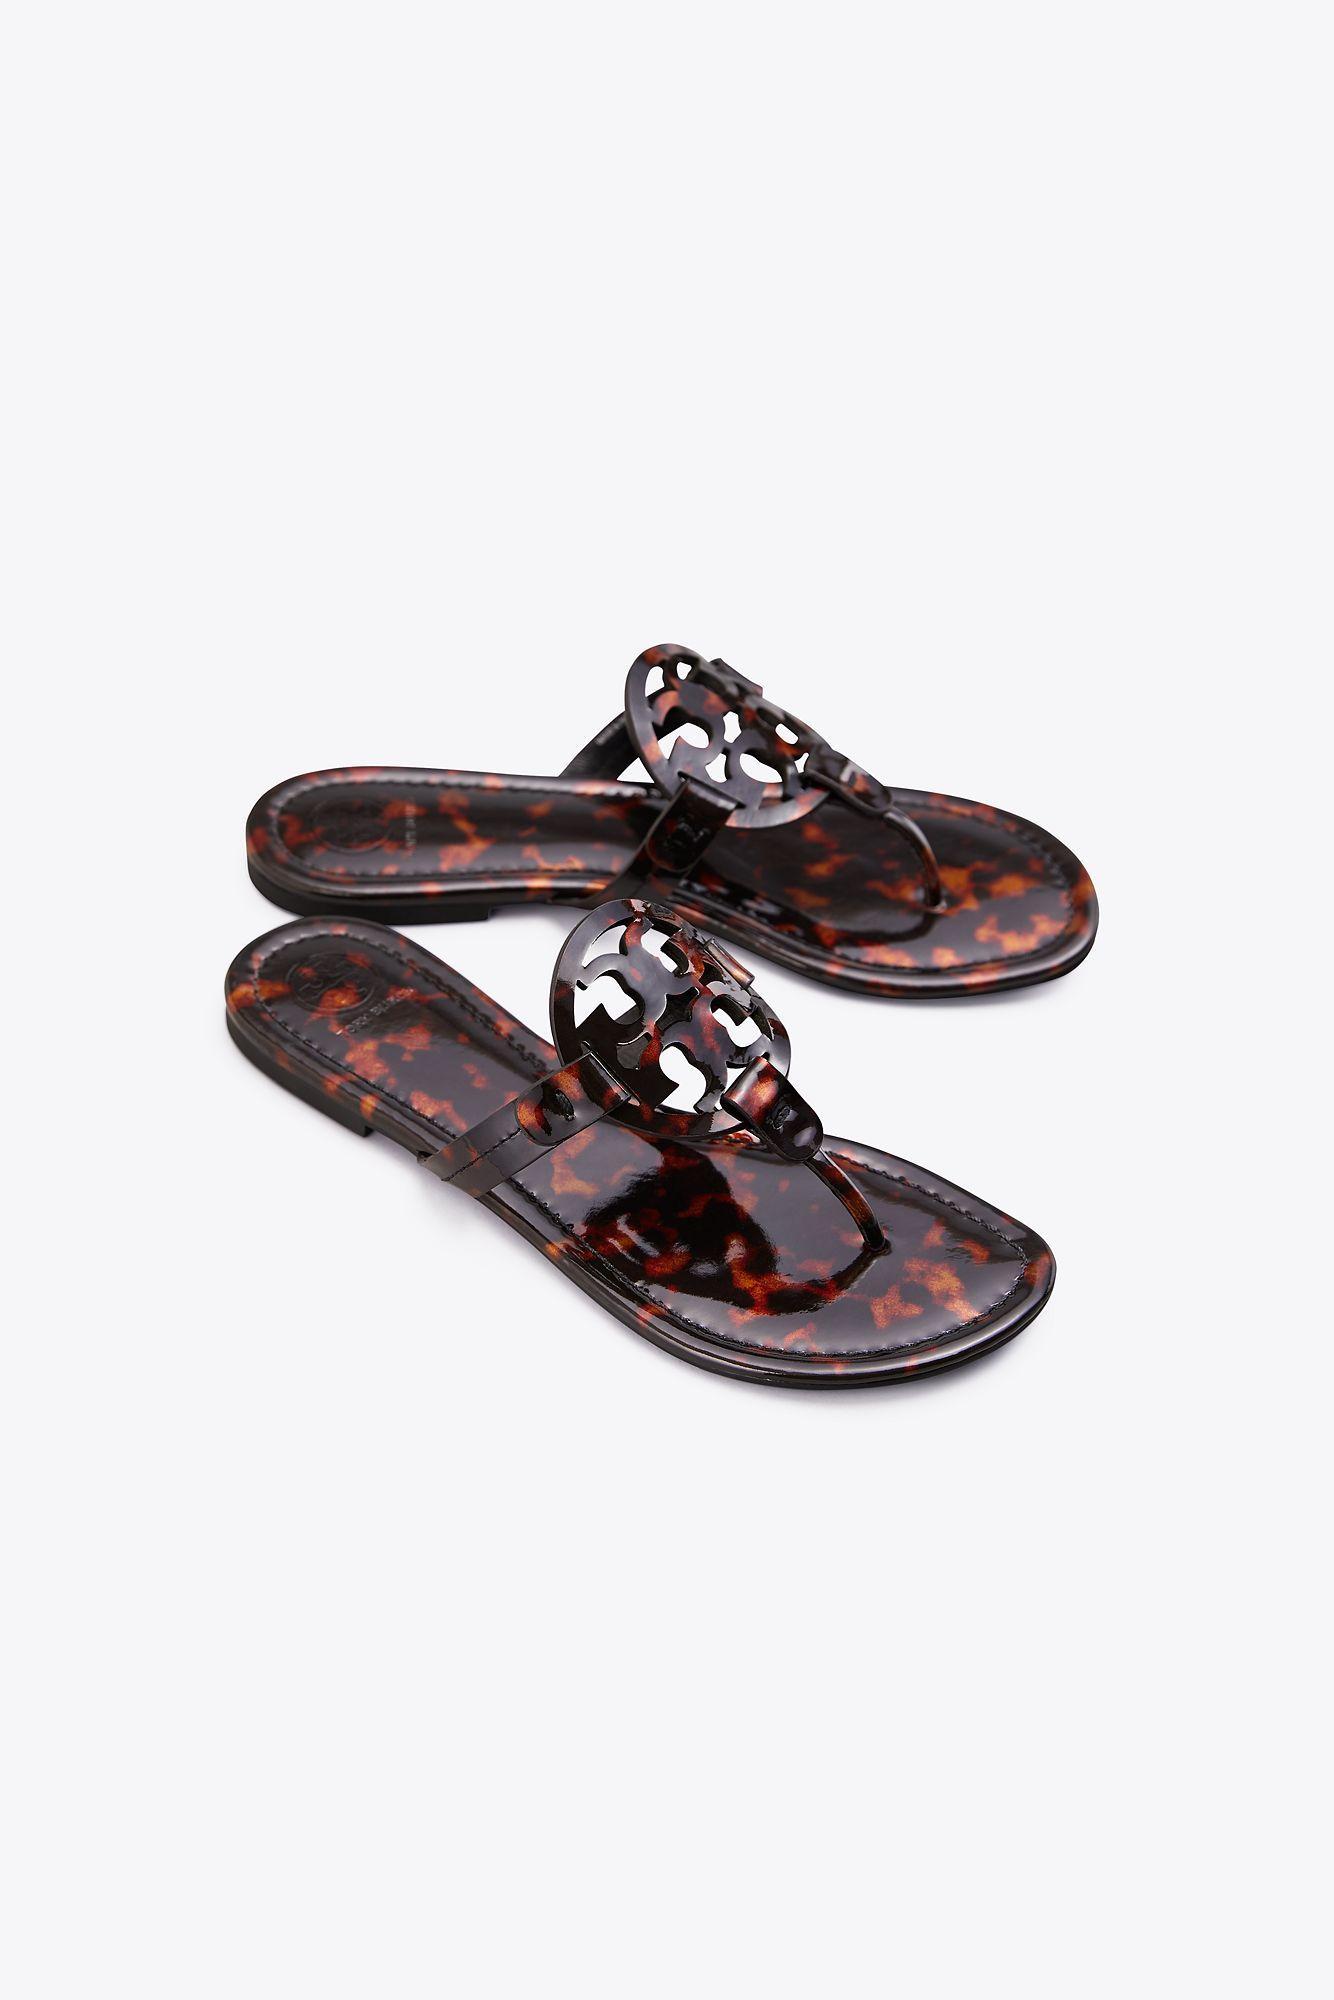 886c89eac Tory Burch Miller Sandals